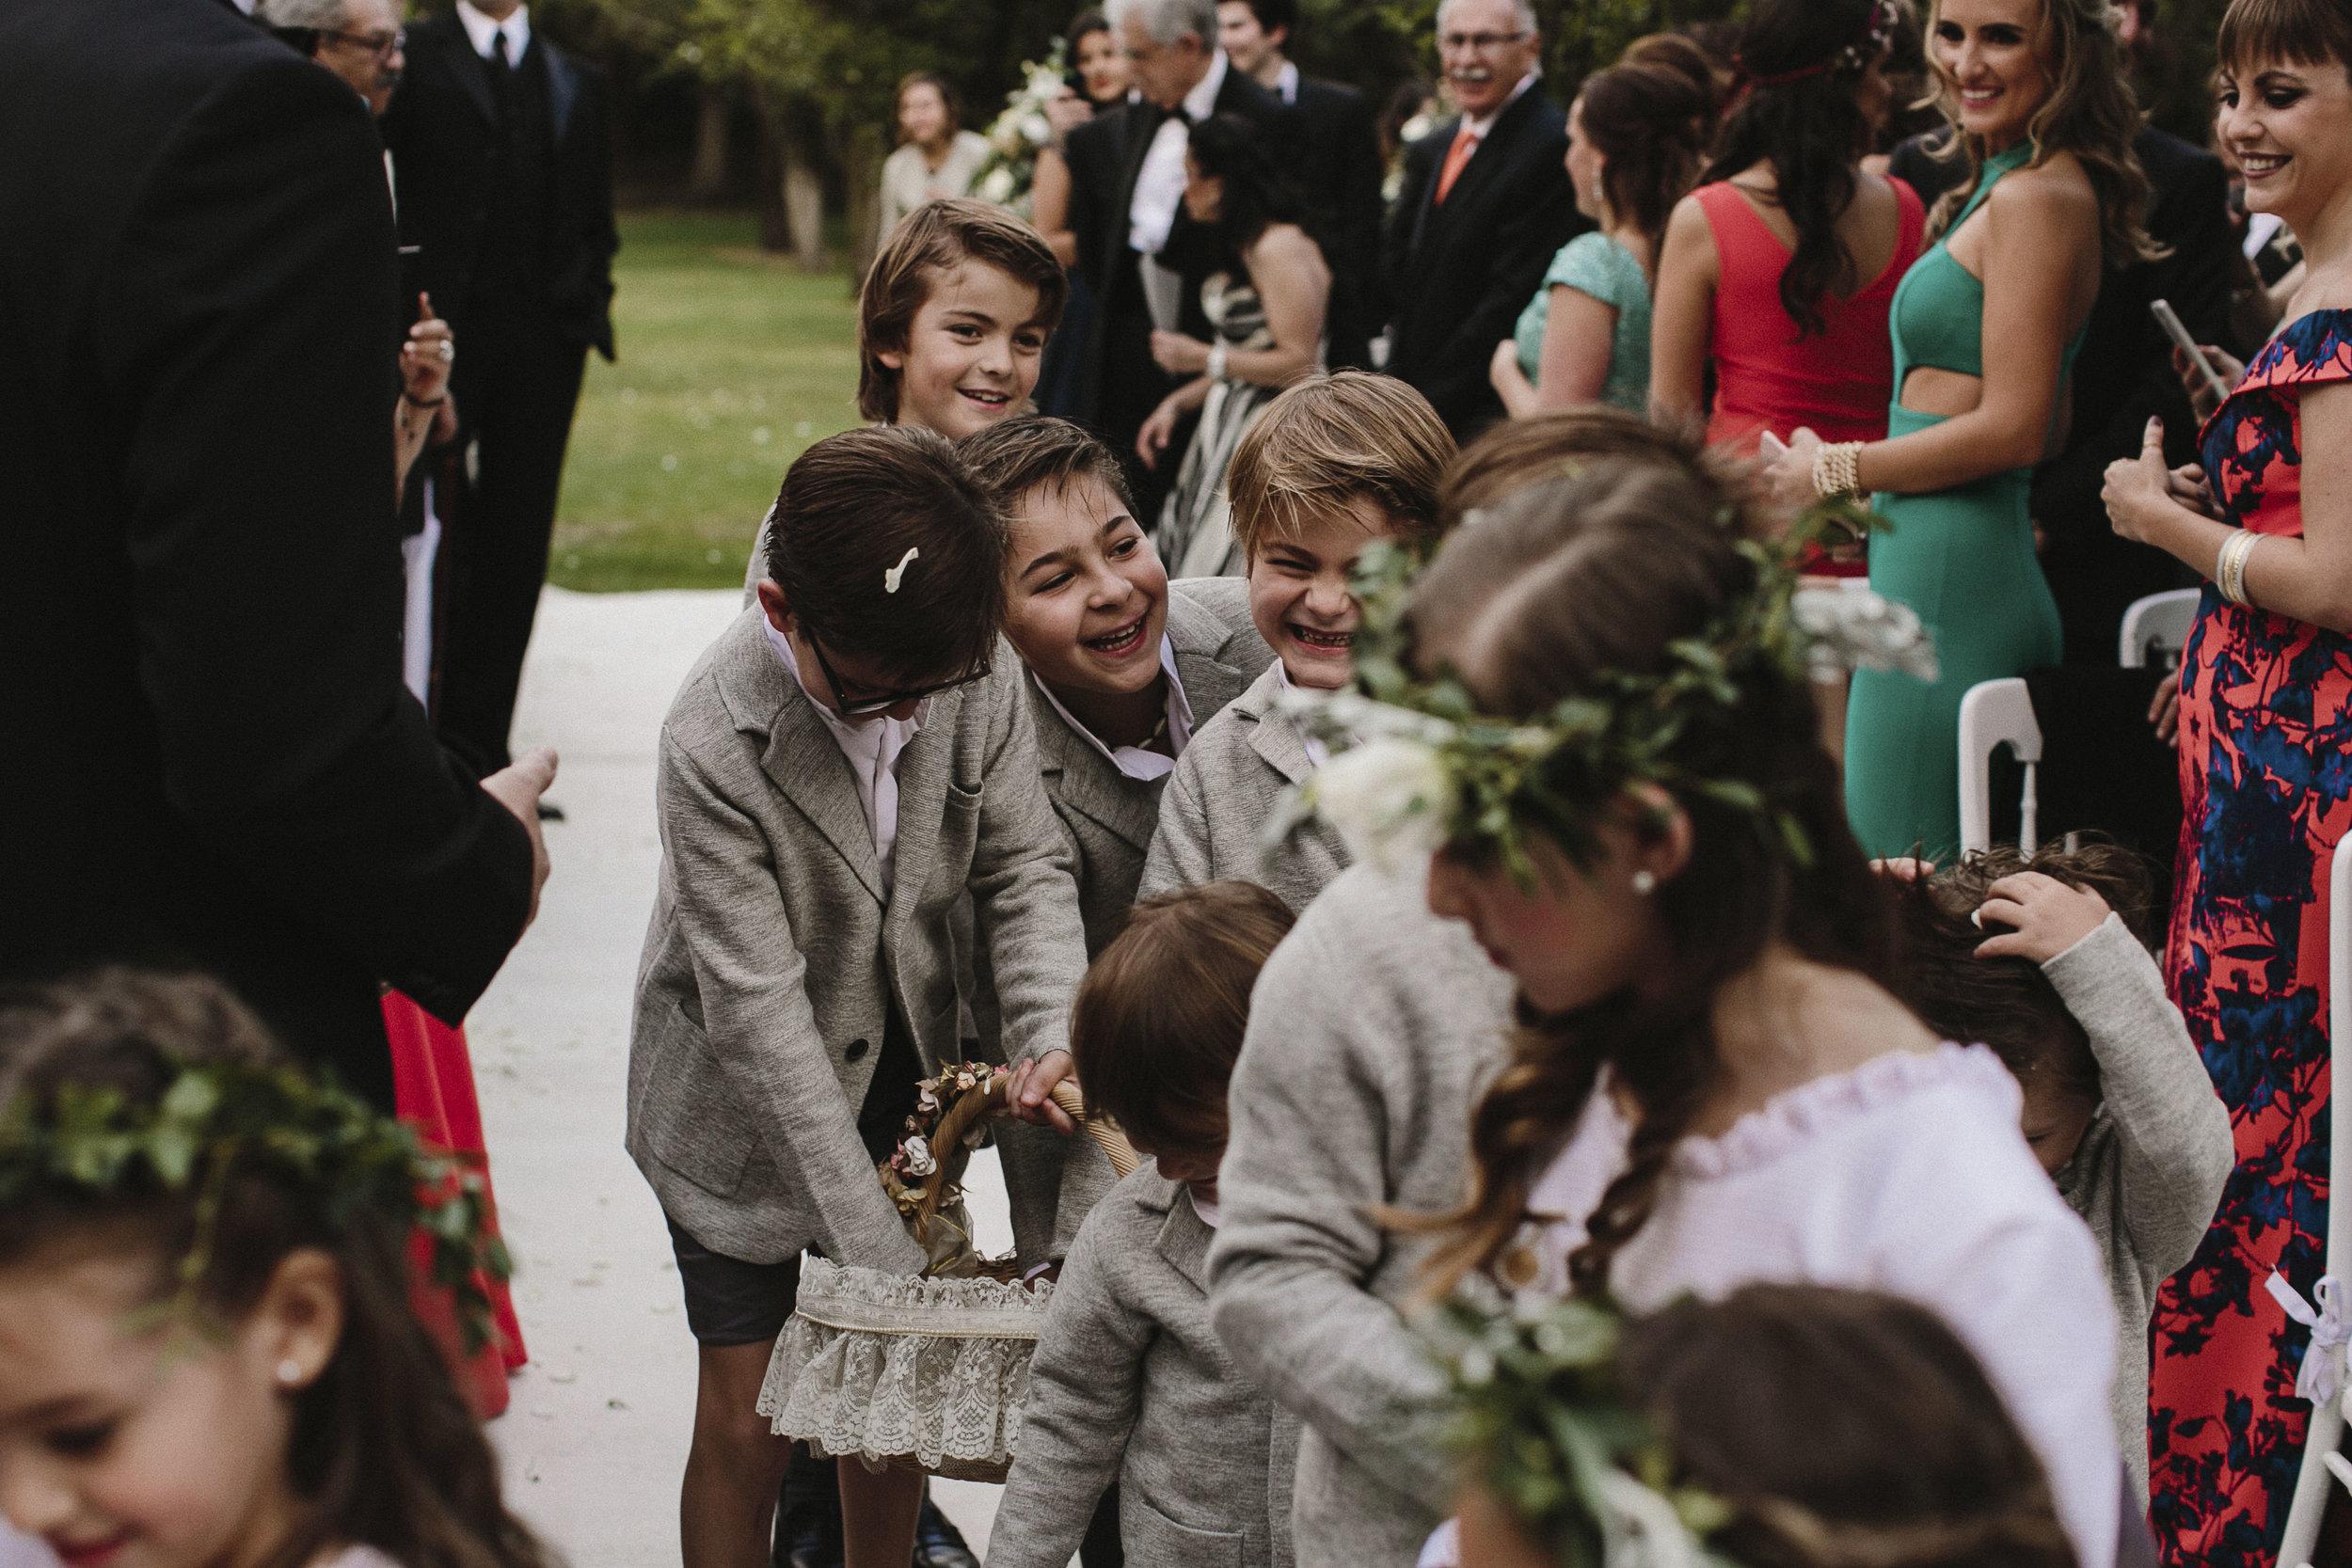 alfonso_flores_destination_wedding_photogrpahy_paola_alonso-382.JPG